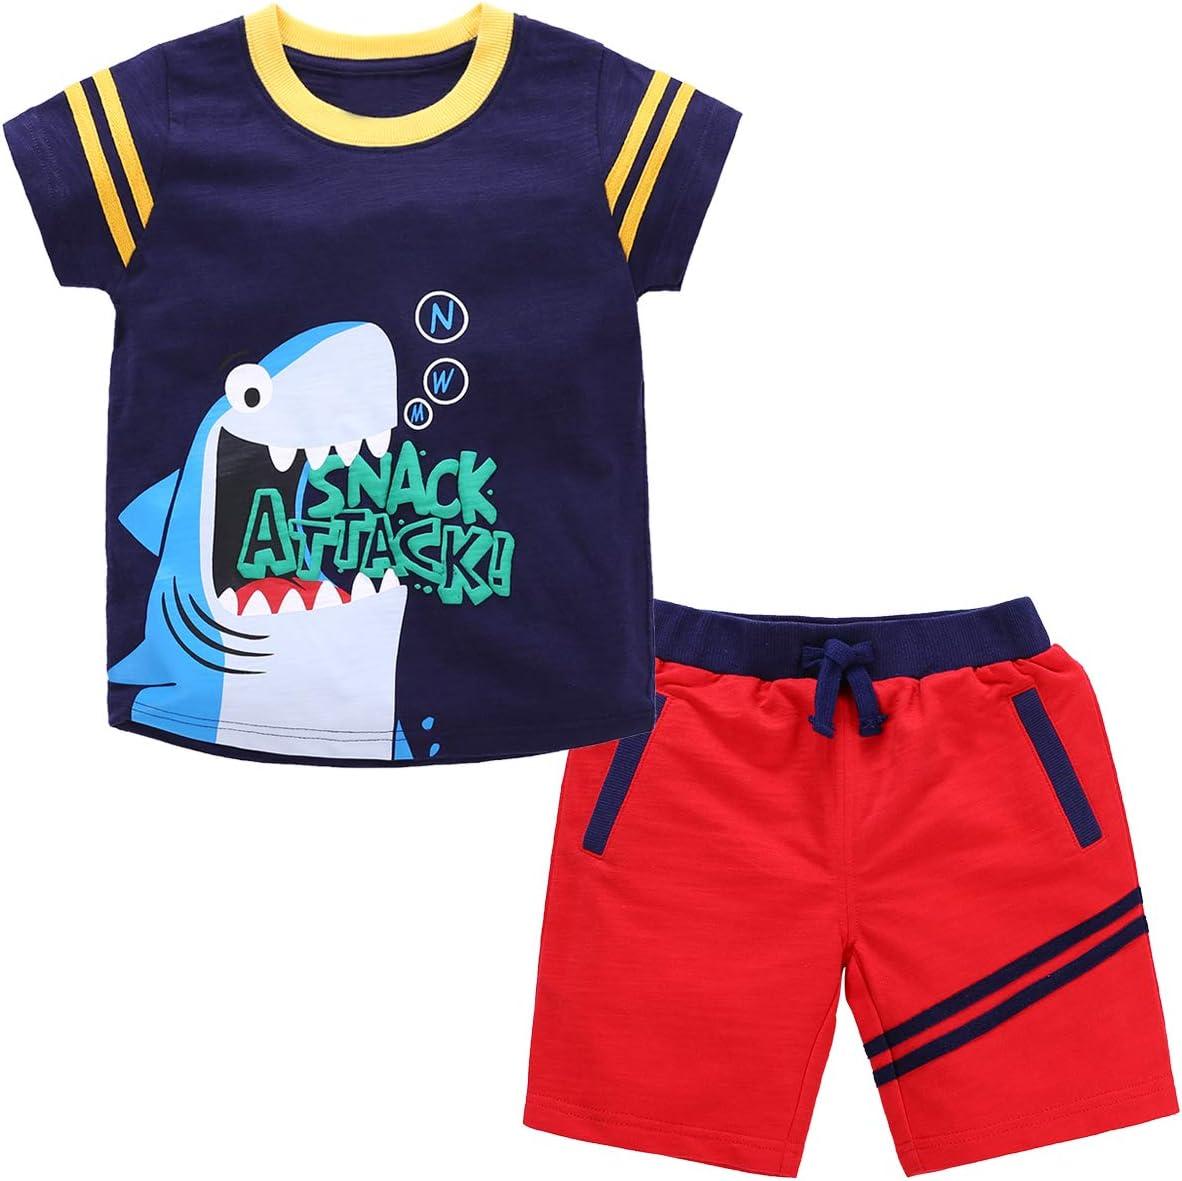 Kanodan Toddler Baby Boy Short Set Outfits Summer Short Sleeve T-Shirt+Stripe Short Pant Clothes Sets